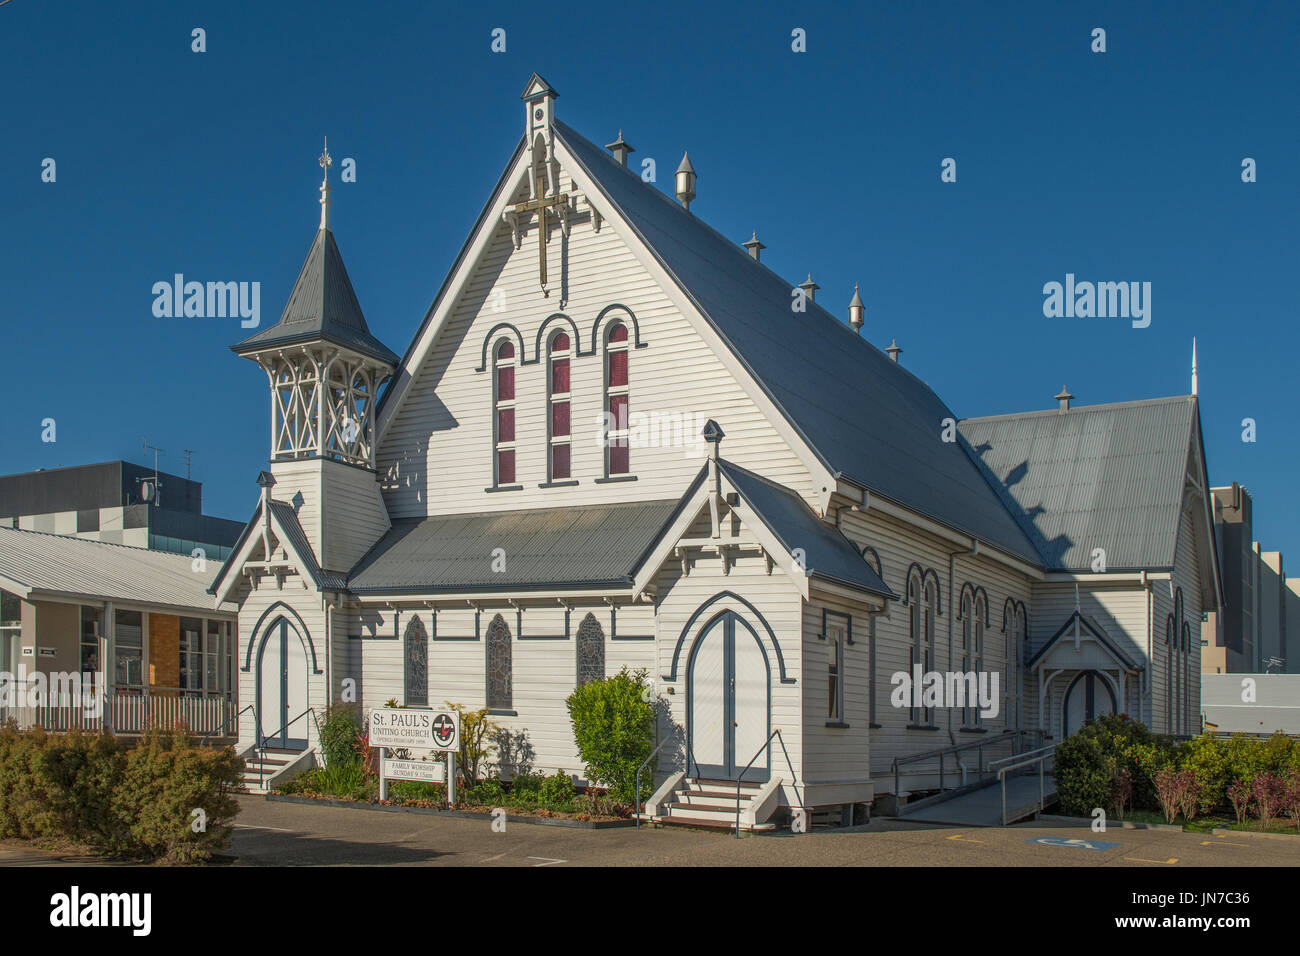 Art Deco St Paul's Uniting Church, Mackay, Queensland, Australia - Stock Image